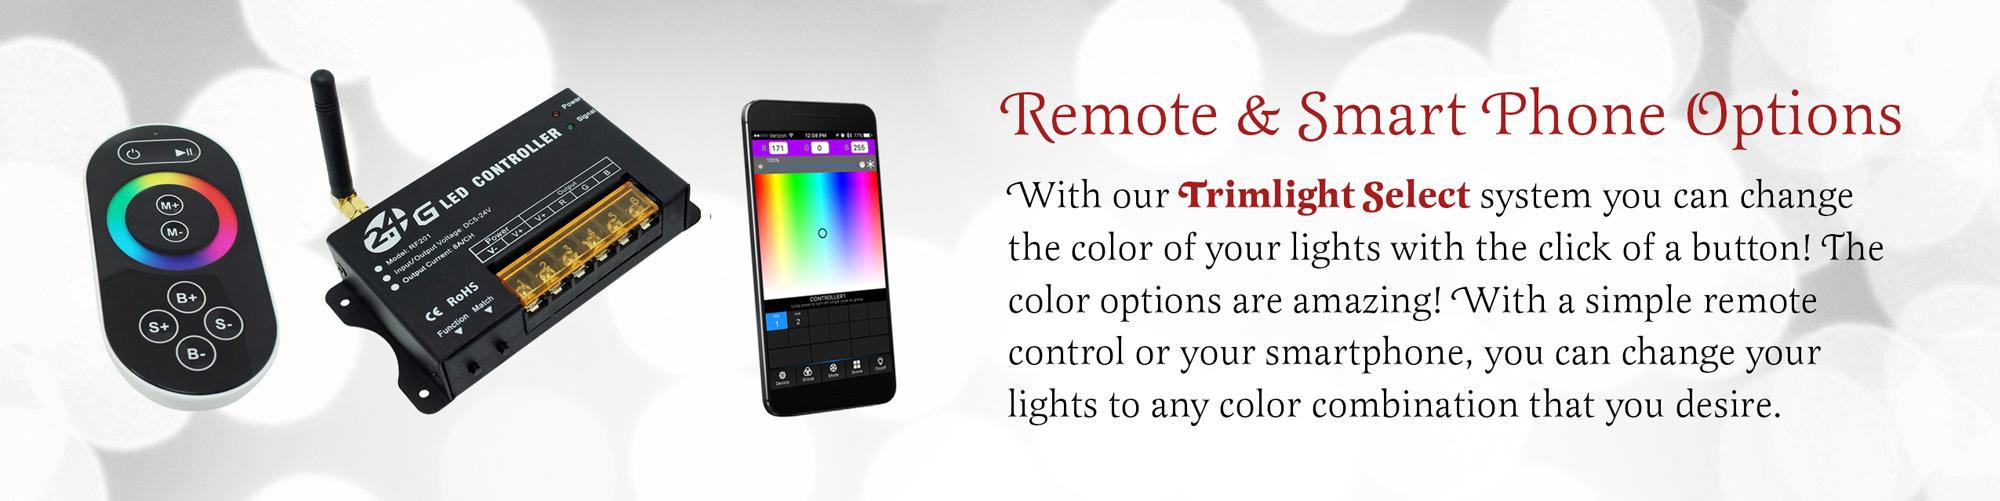 Trimlight LED Technology